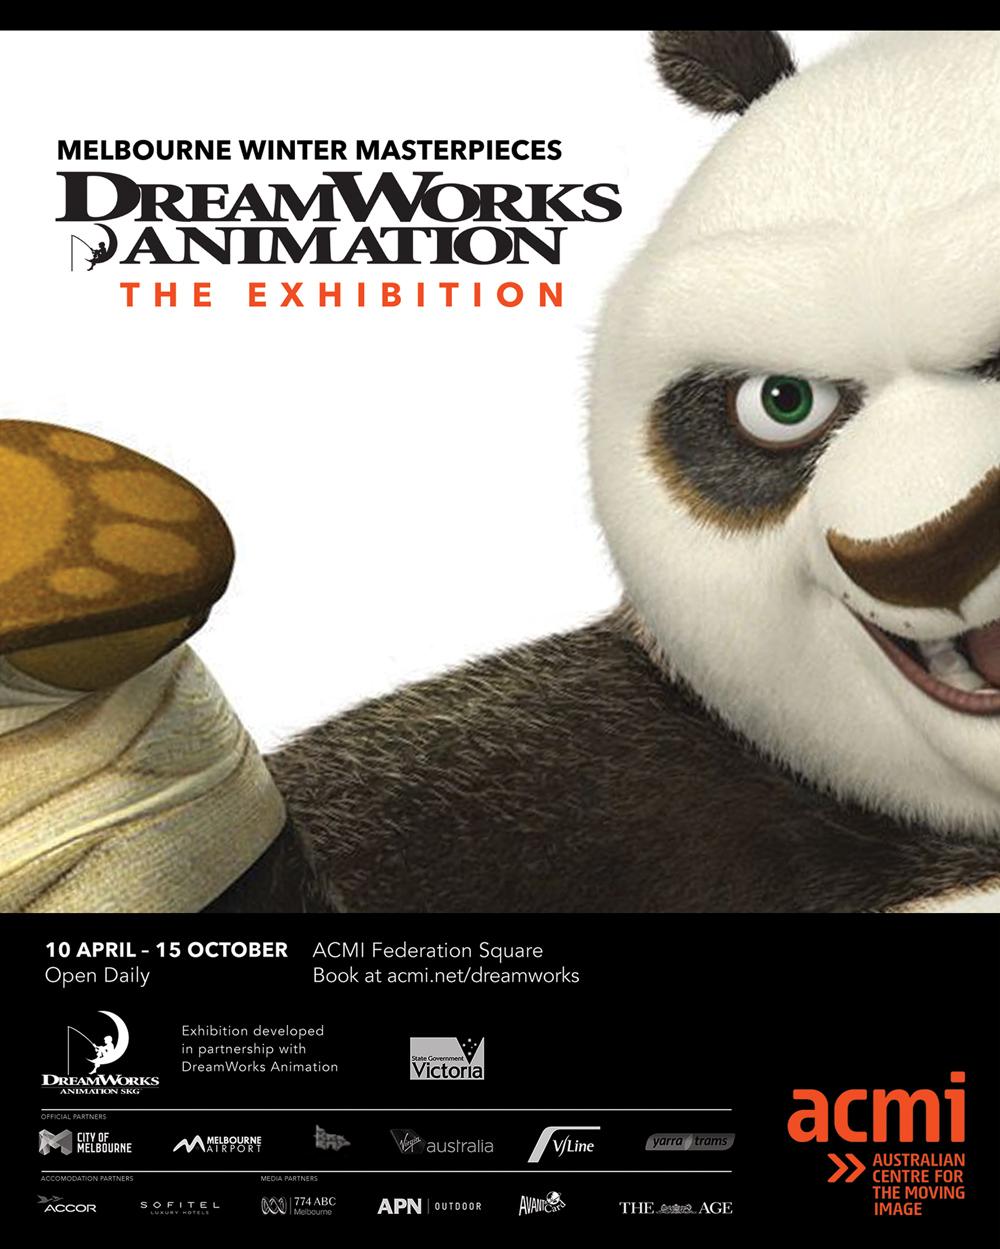 Dreamworks_Campaign_05.jpg